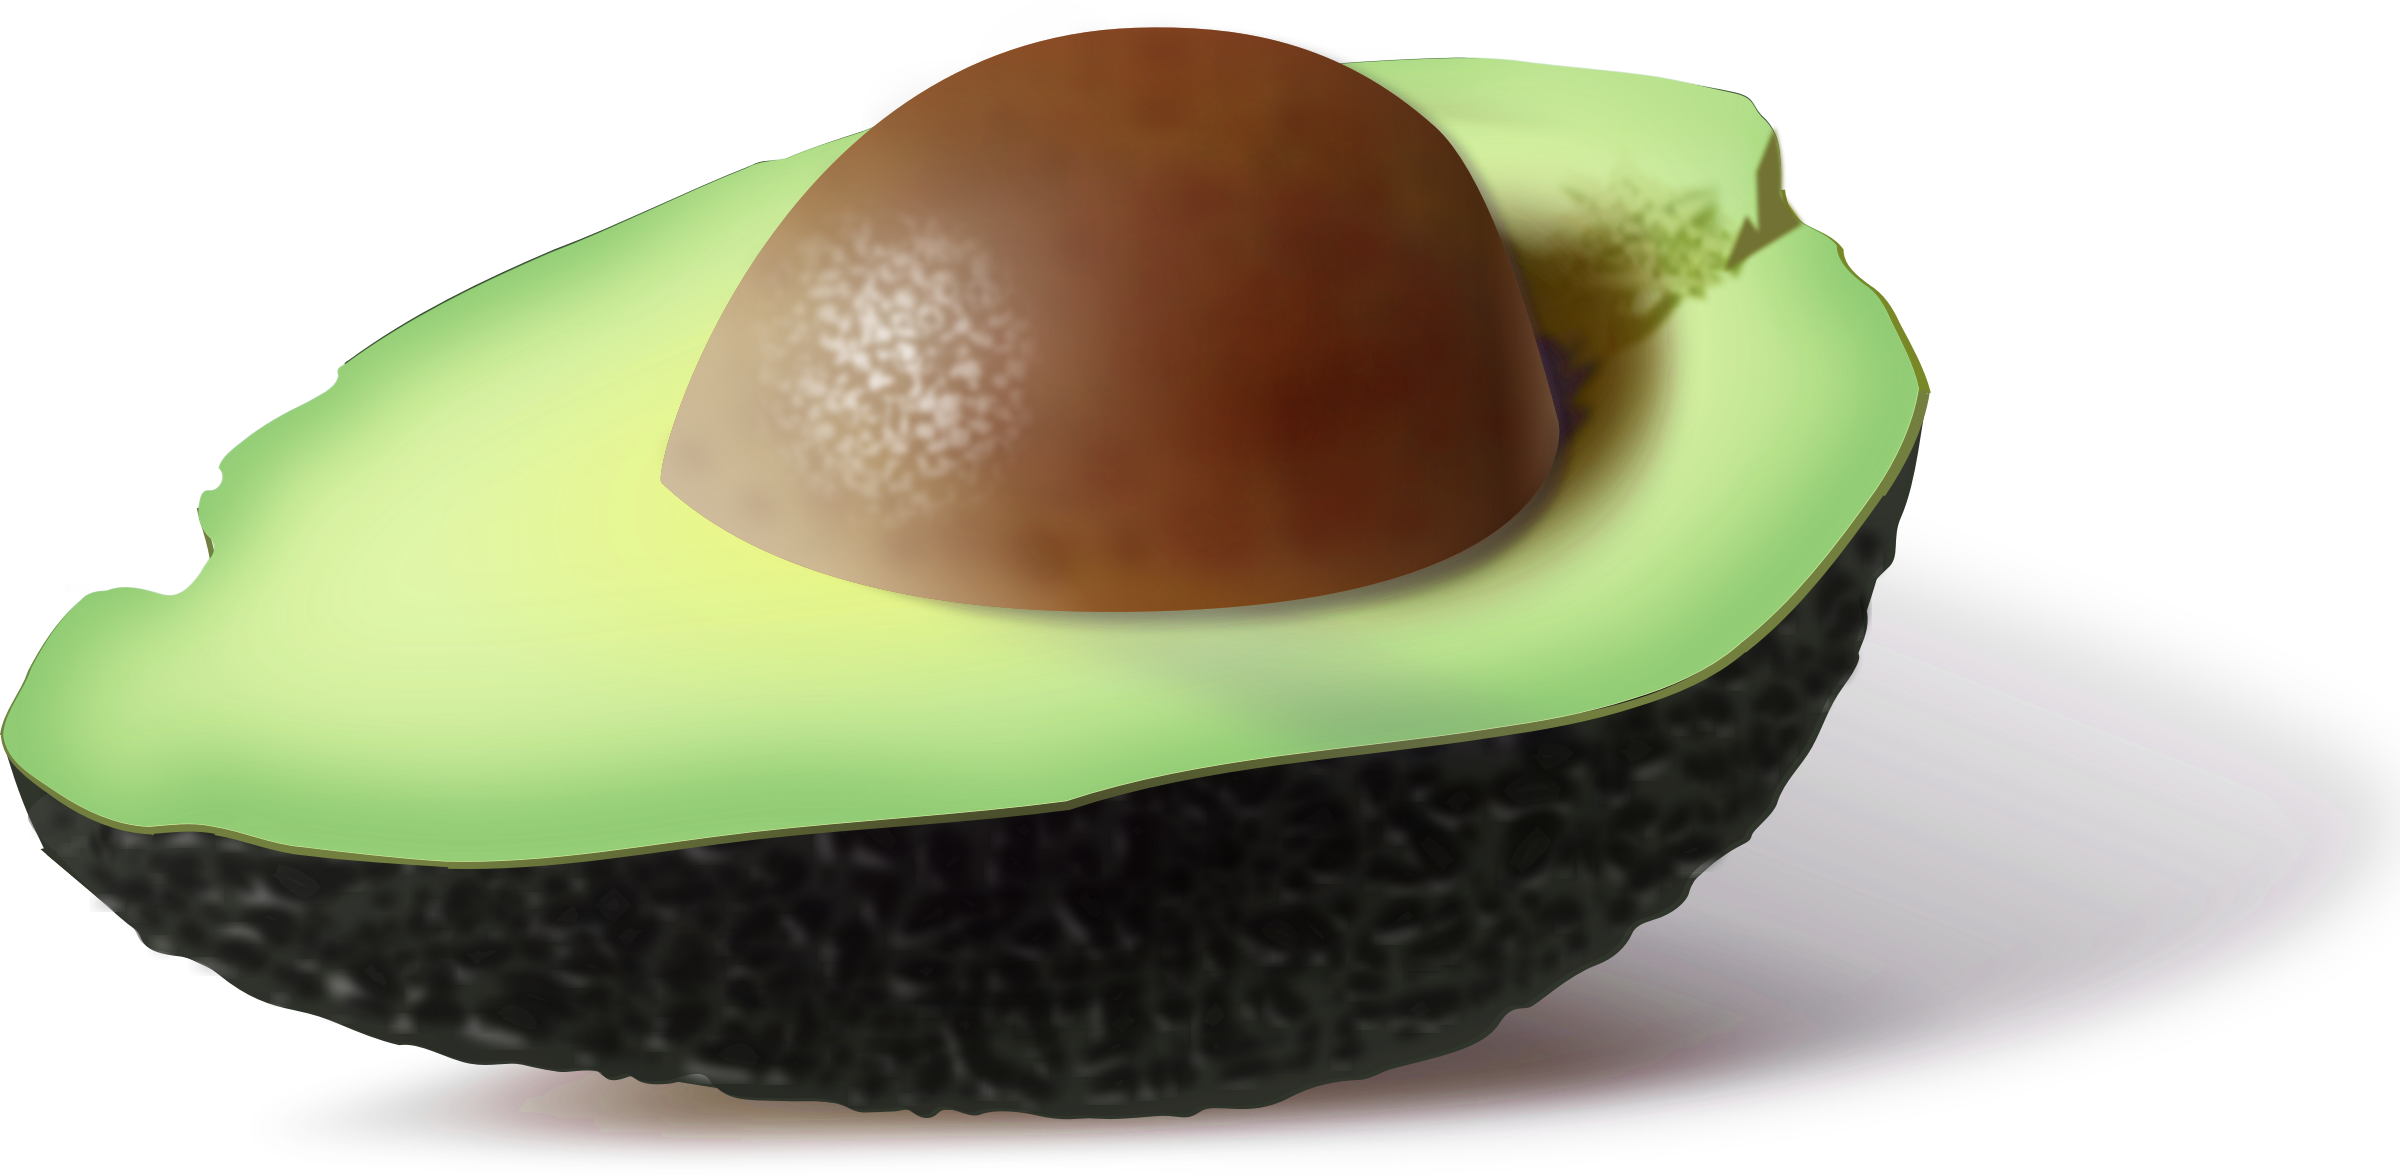 free . Avocado clipart